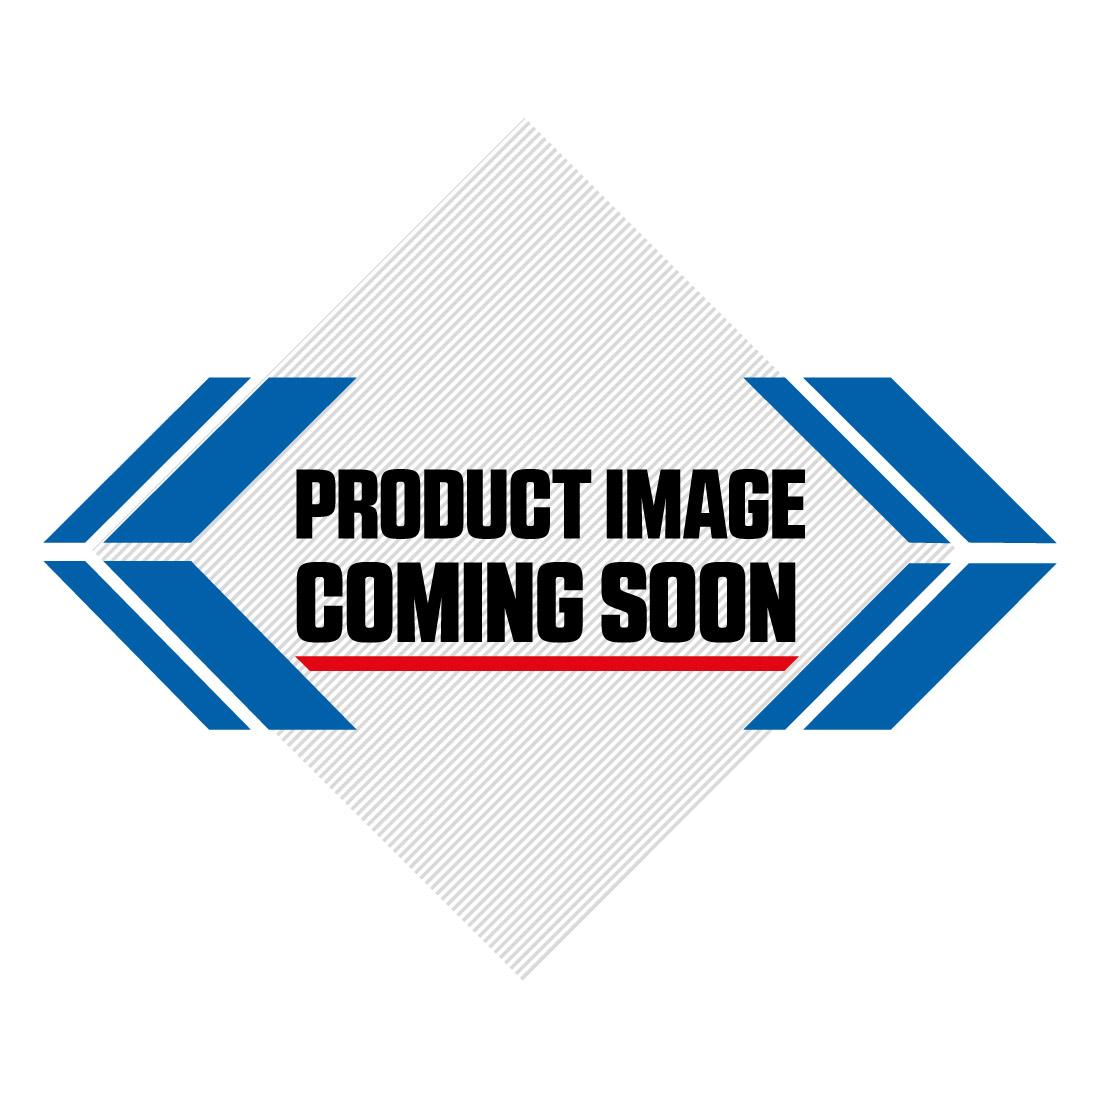 2018 Sidi Crossfire 3 SRS Cairoli Motocross Boots - Ltd Ed Yellow Flo White Image-2